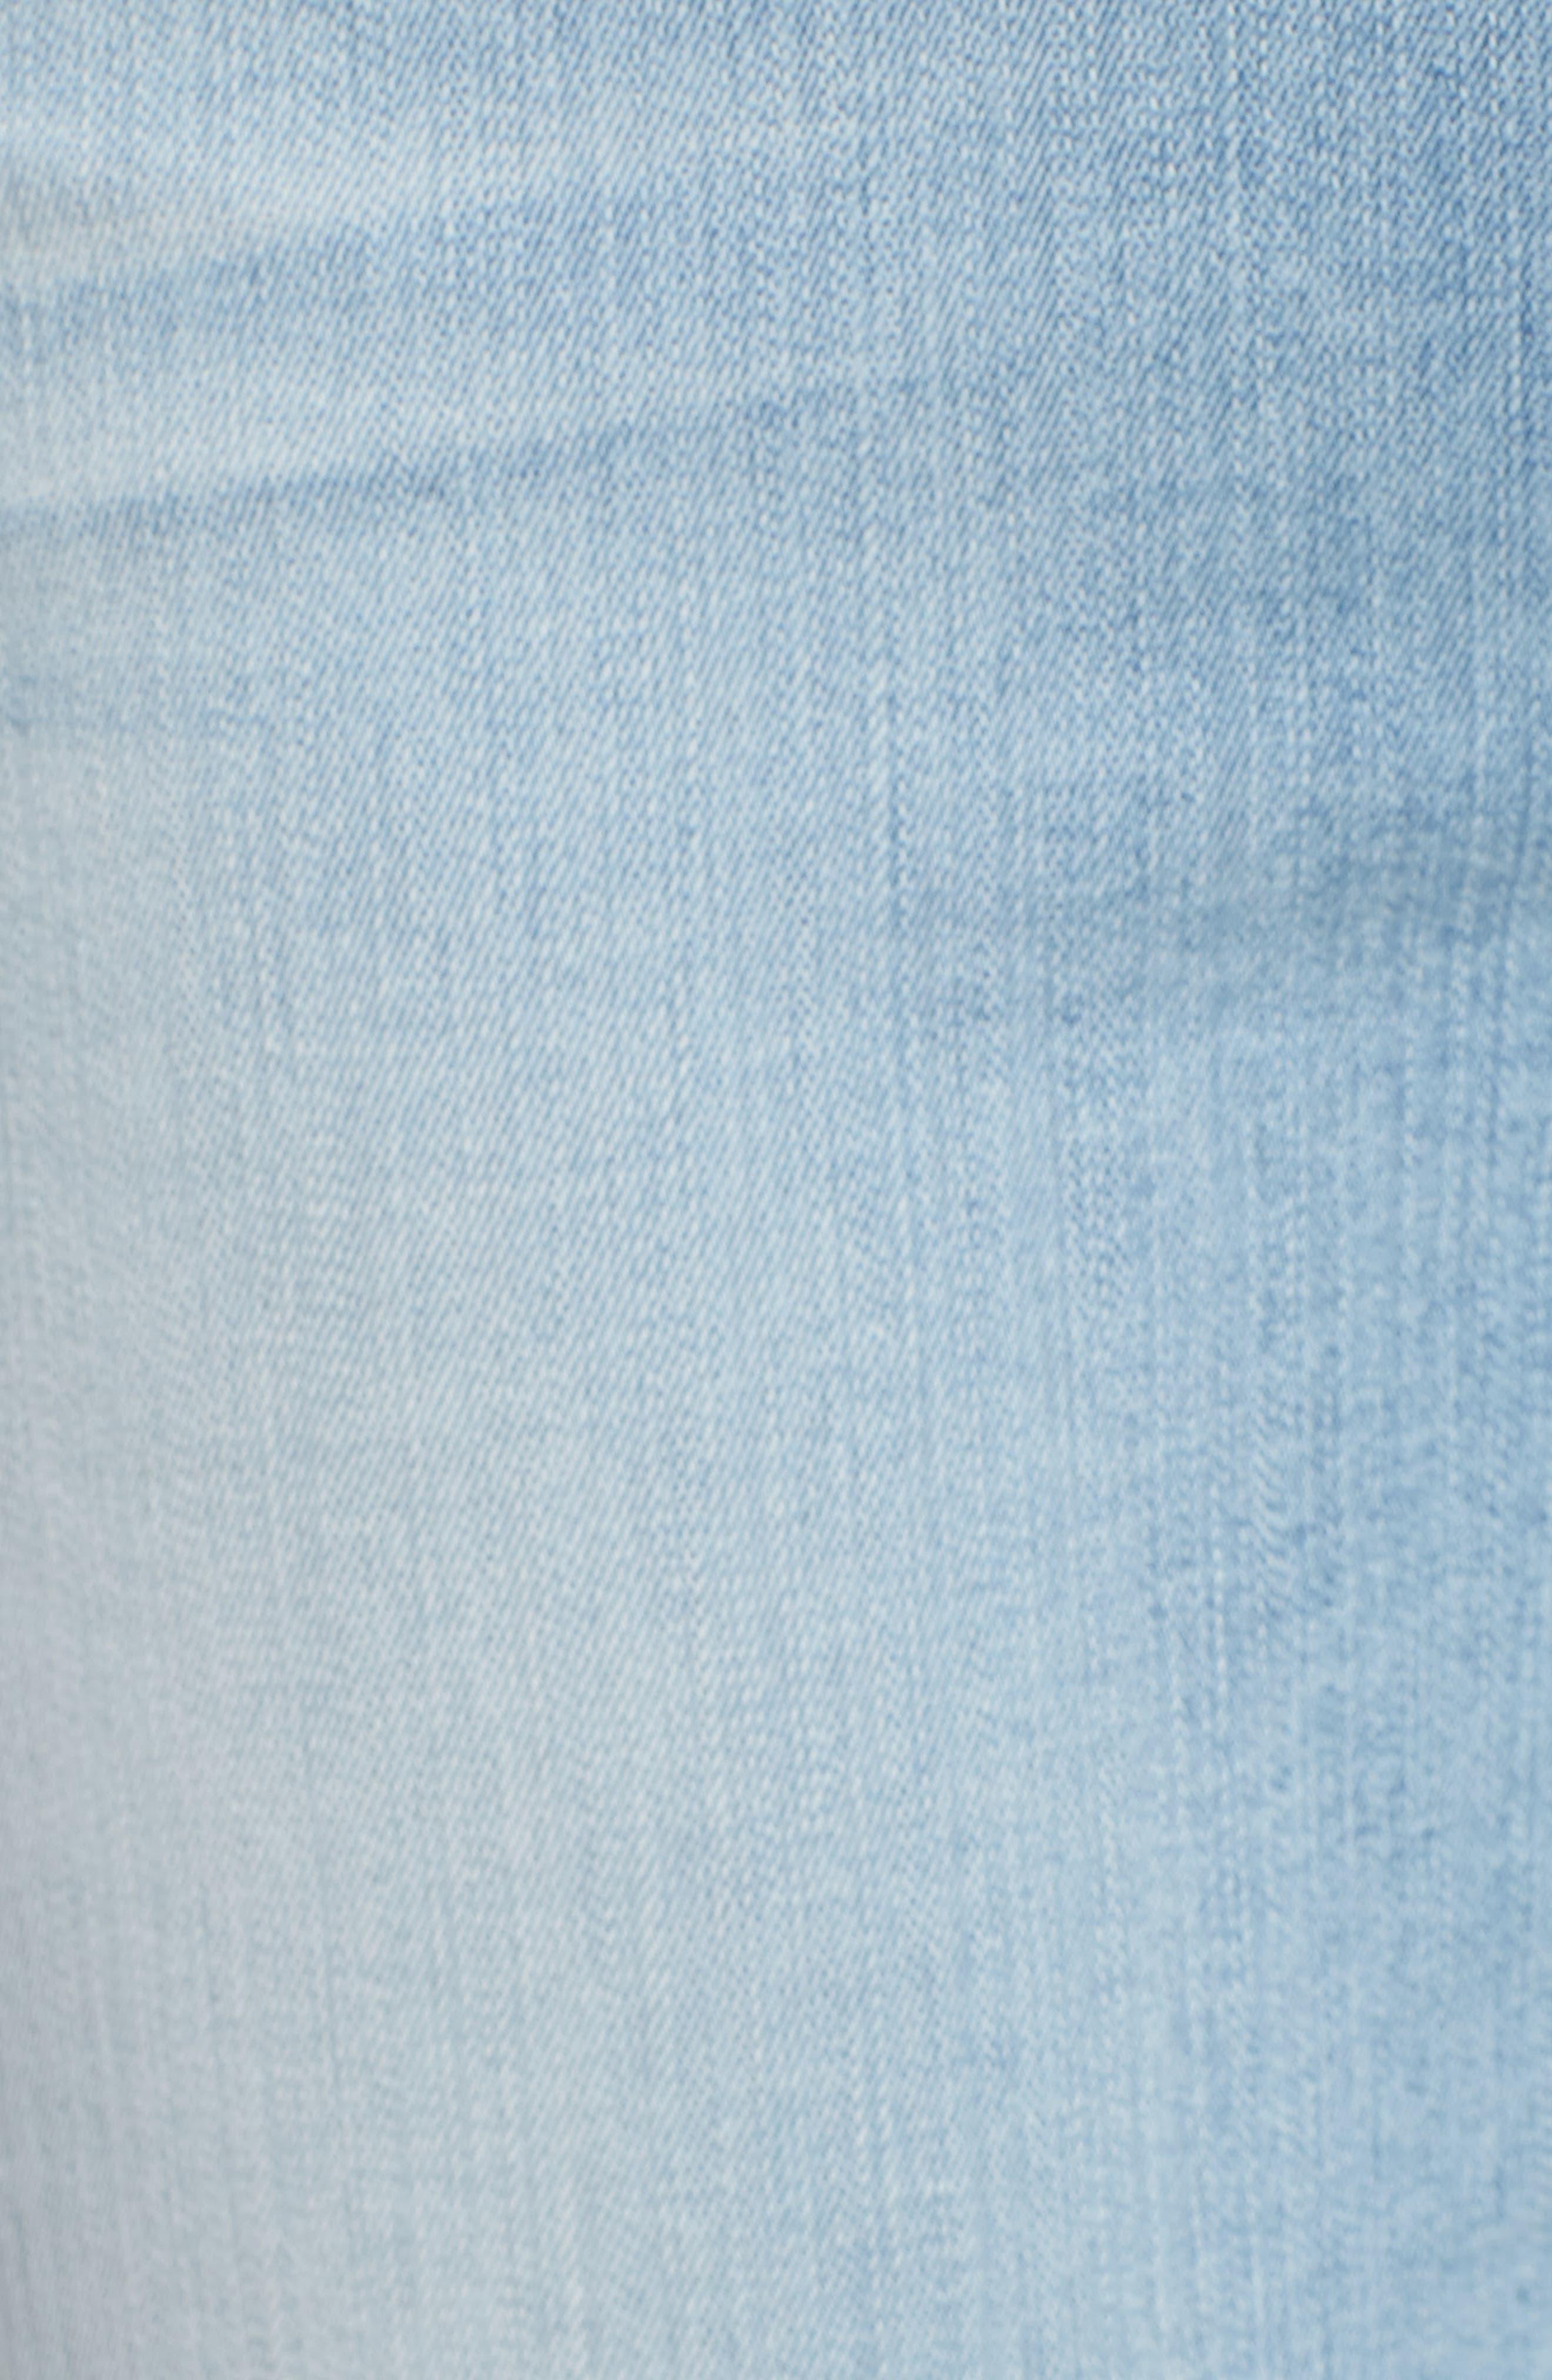 Embroidered Slim Boyfriend Jeans,                             Alternate thumbnail 6, color,                             Riche Touch Playa Vista